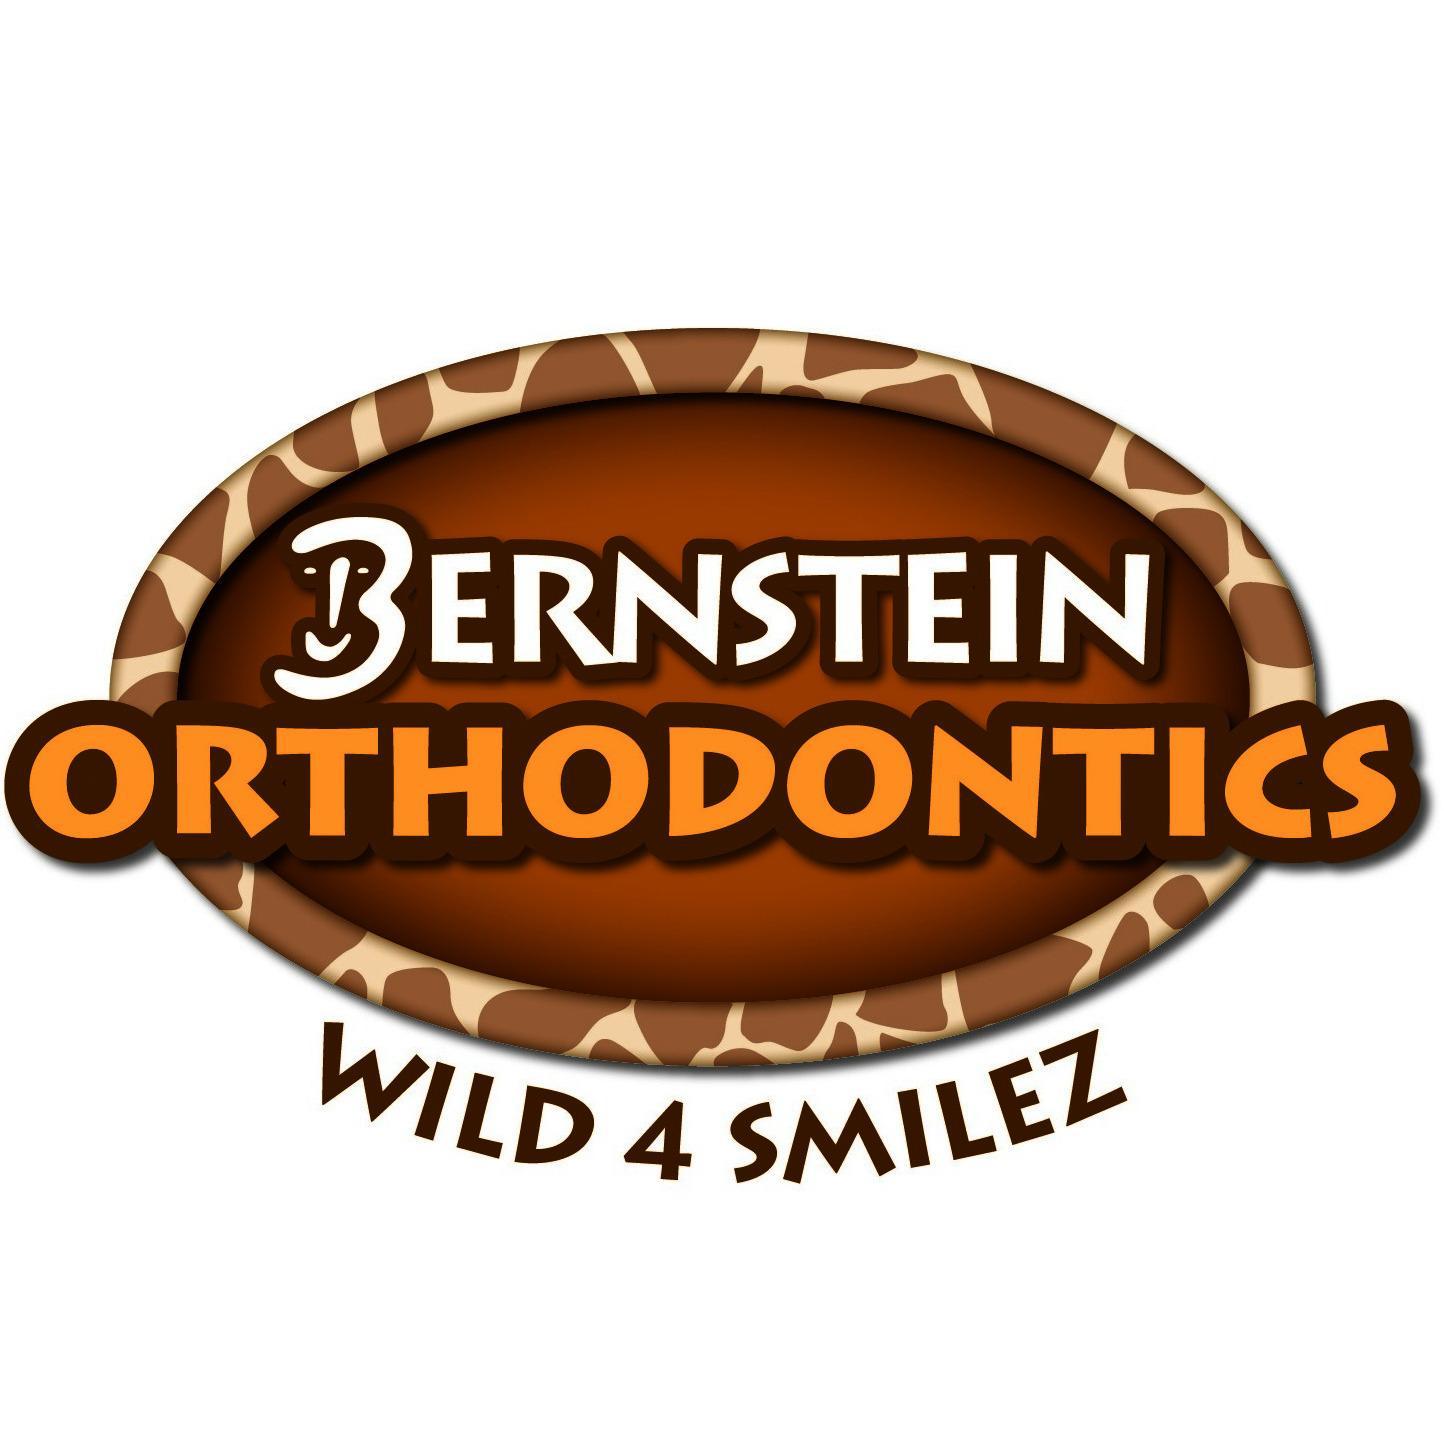 Bernstein Orthodontics